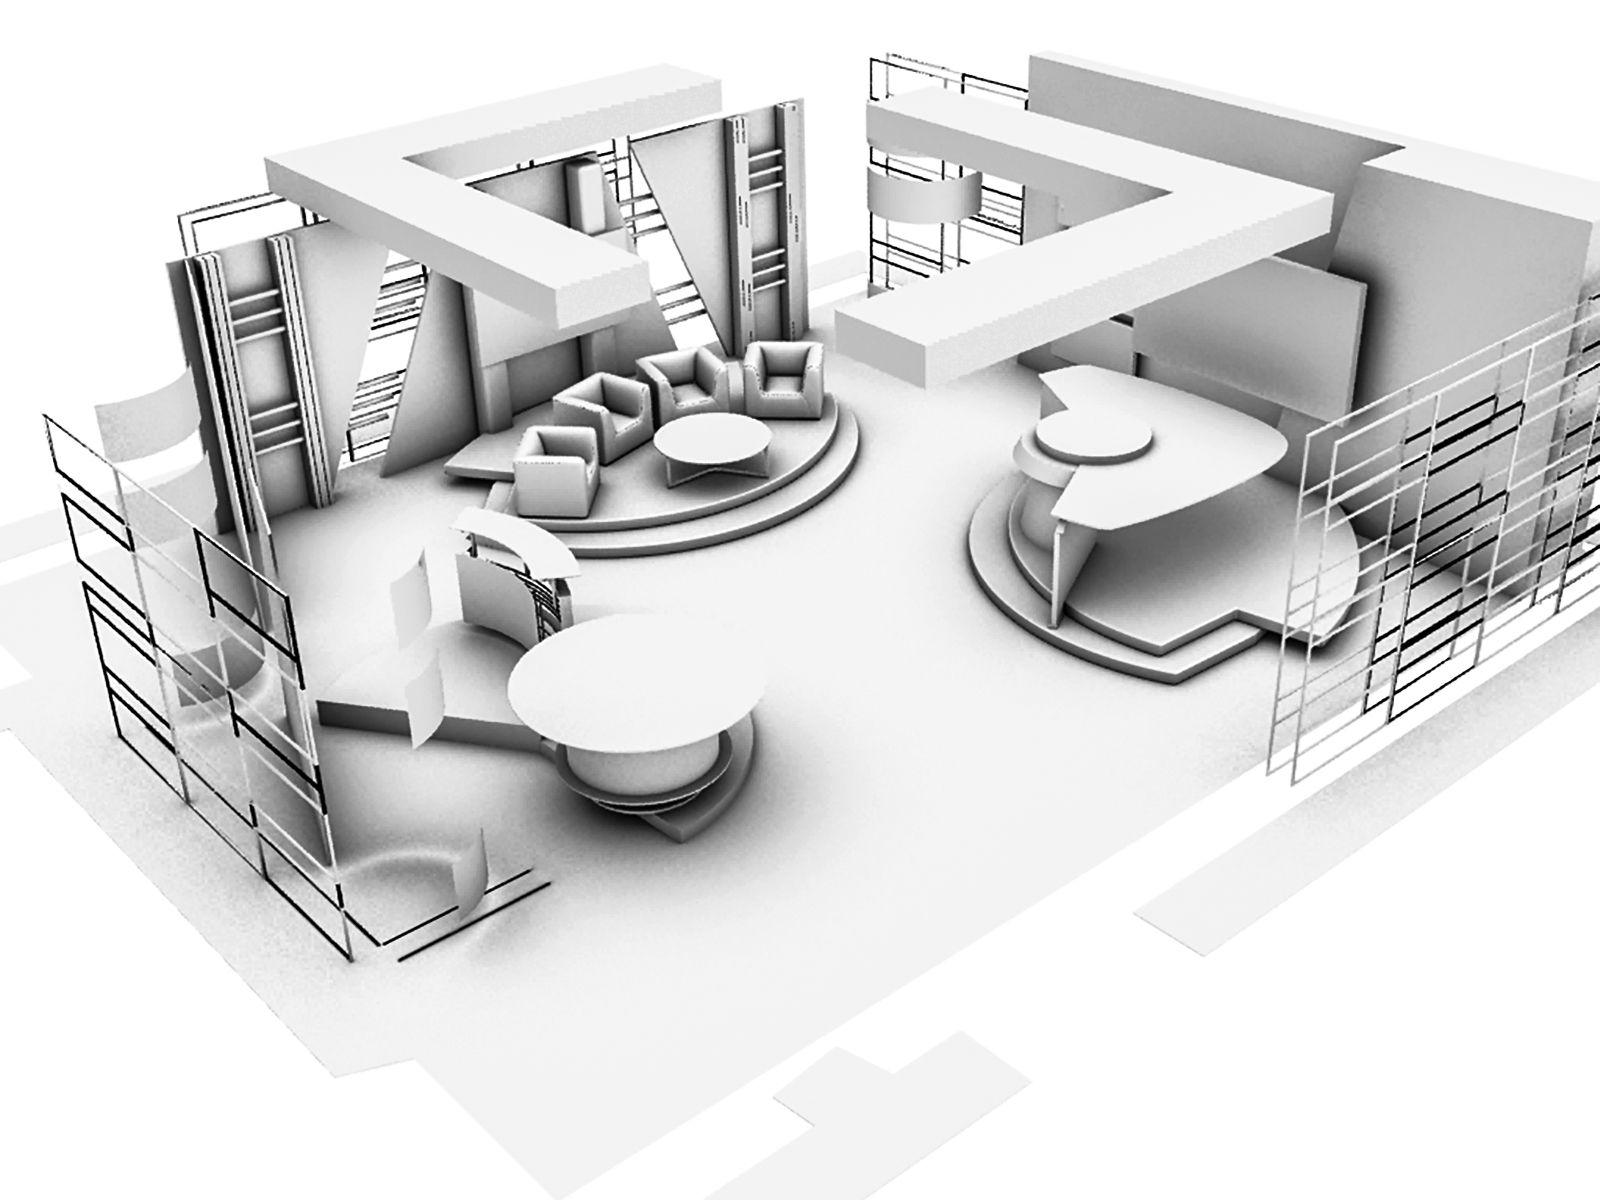 Broadcast Set Design For Info Programs Tv Avala Belgrade Serbia 01 Interior Design Programs Tv Set Design Tv Design